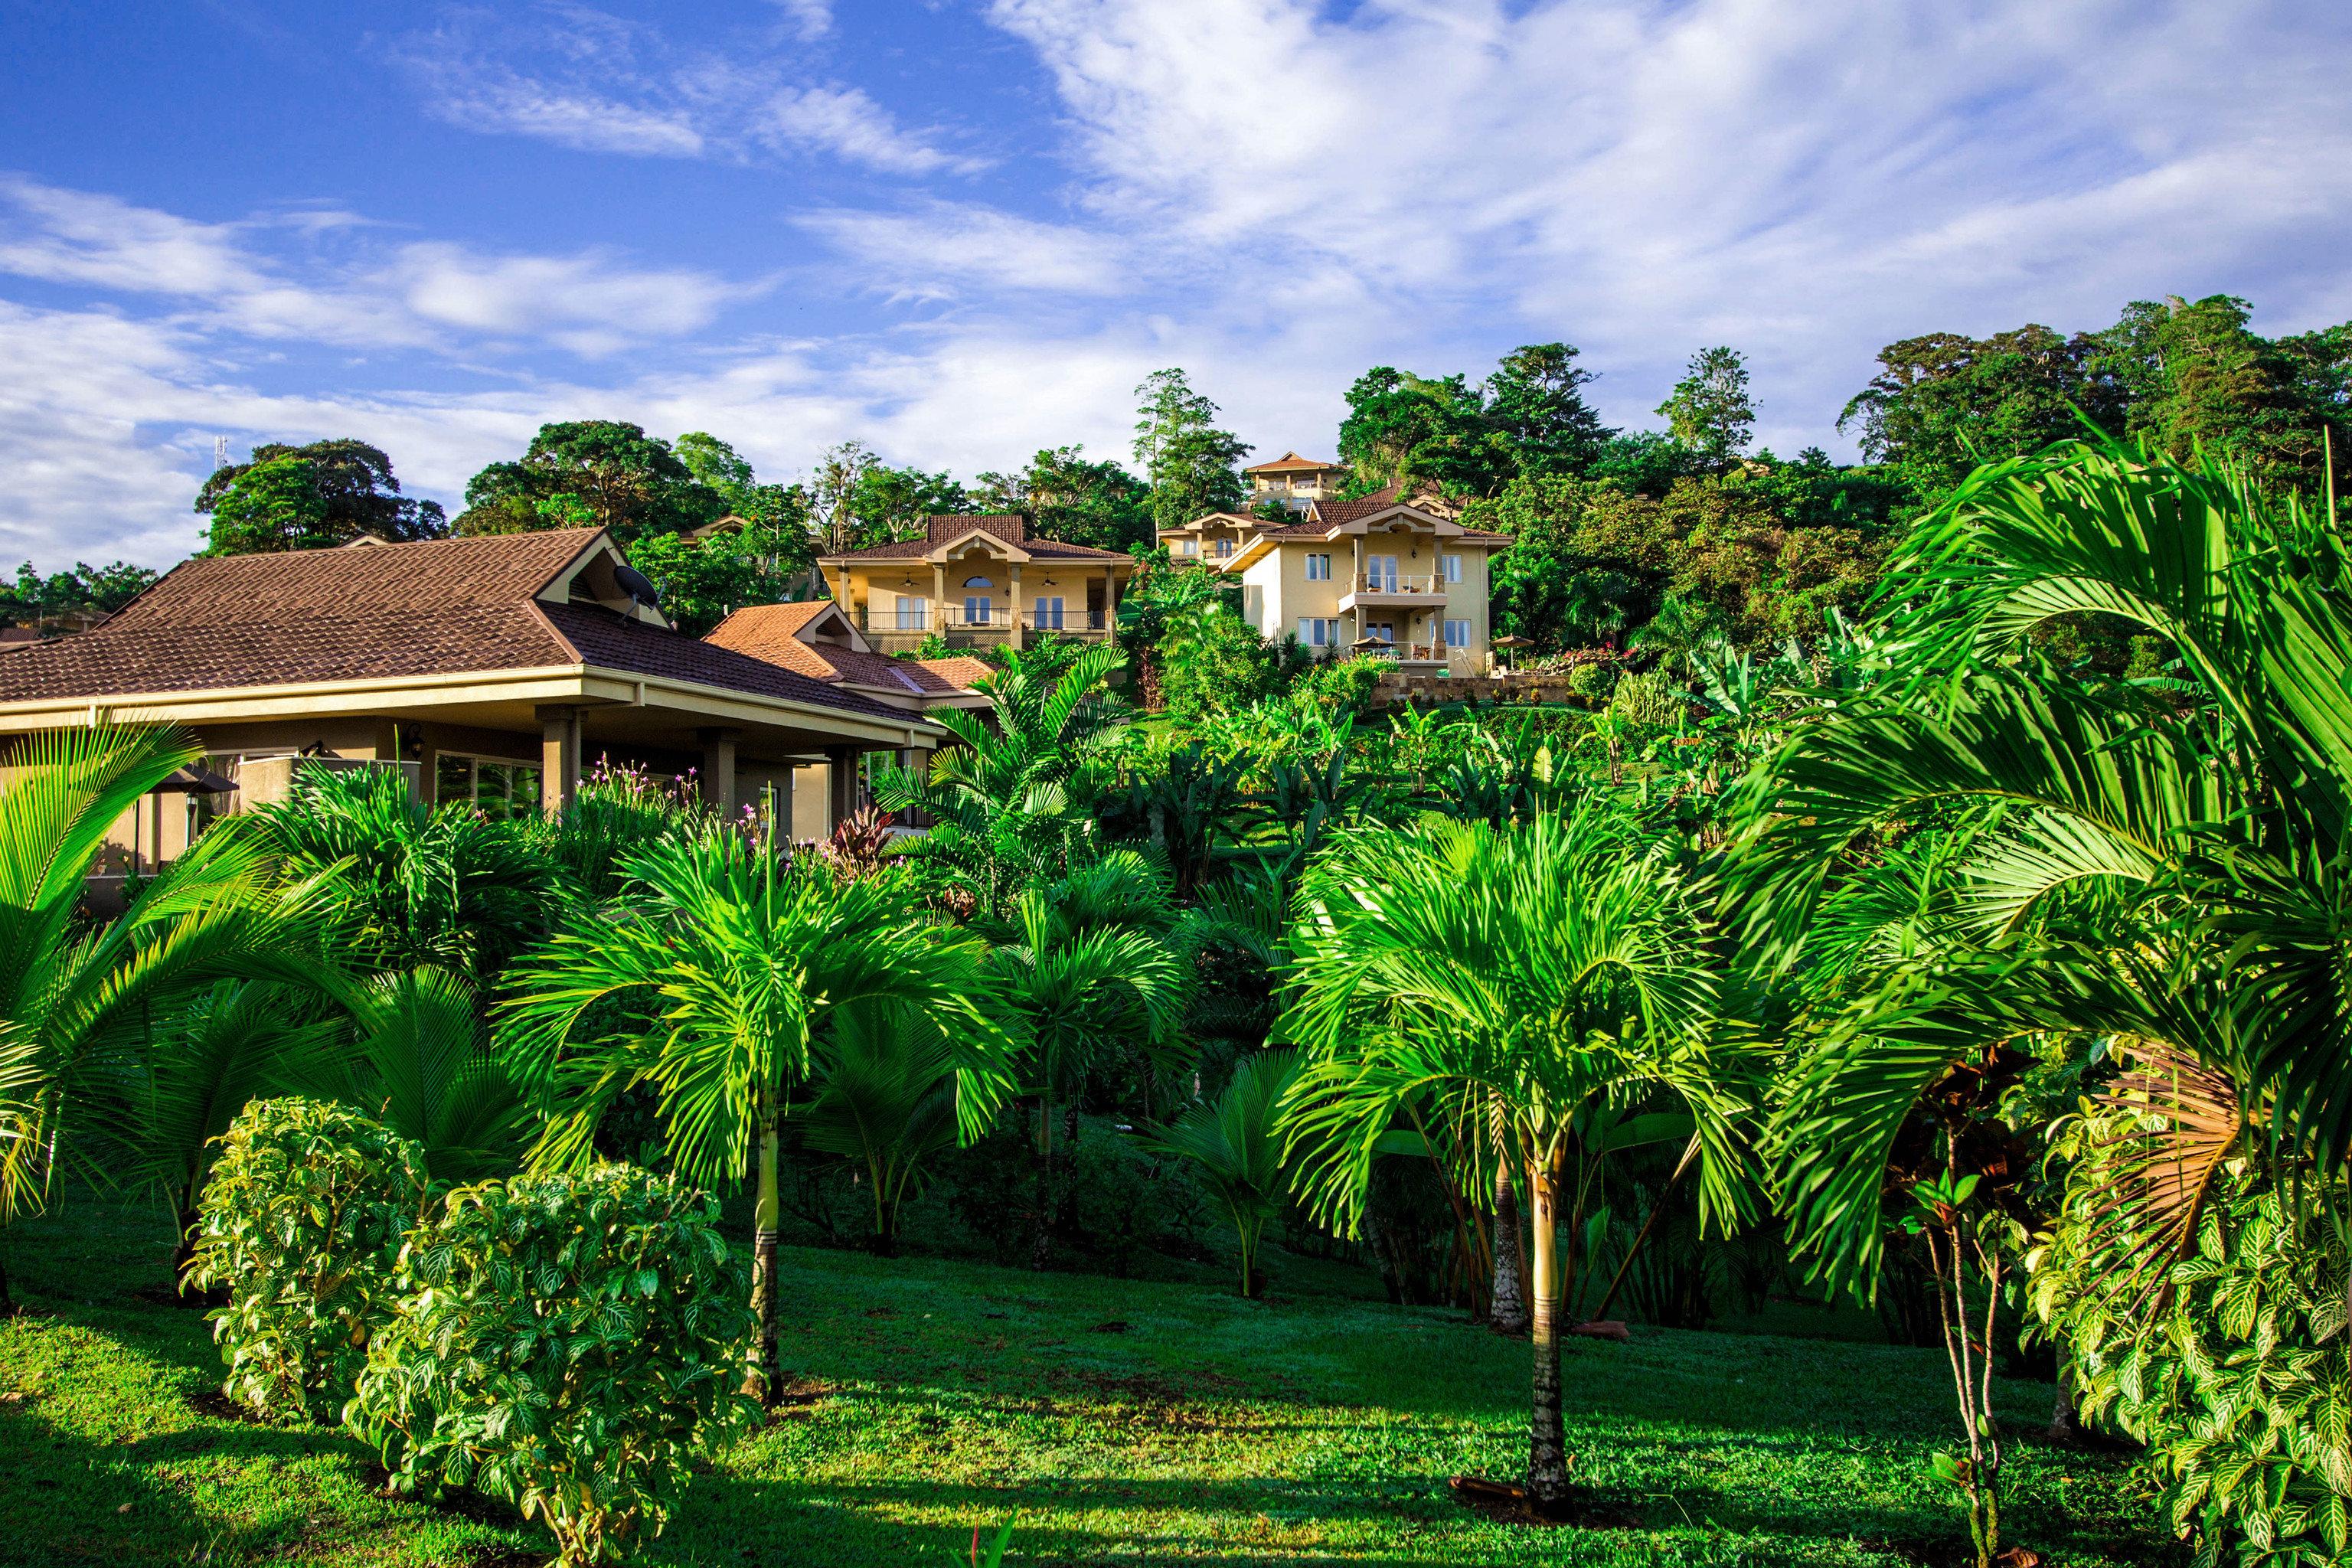 tree botany Resort green arecales Garden tropics plantation rural area plant Jungle flower Village lush